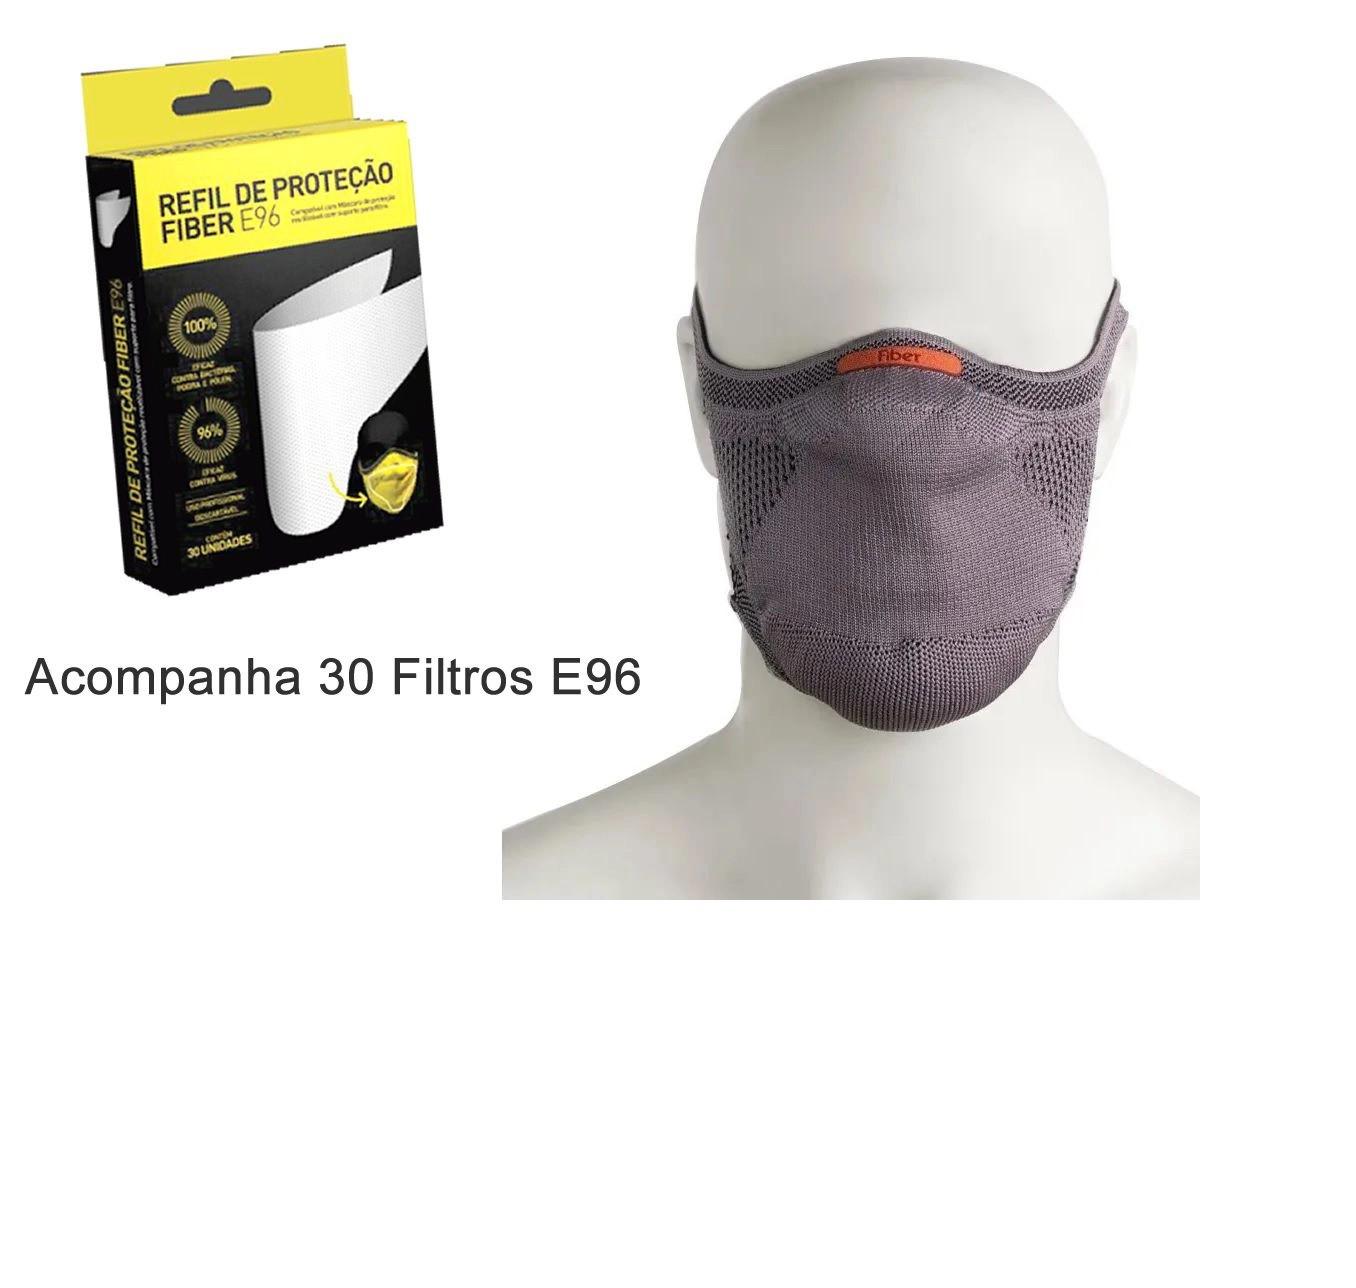 kit 30 Filtros E96 Mascara Proteção Fiber knit  - Unicar